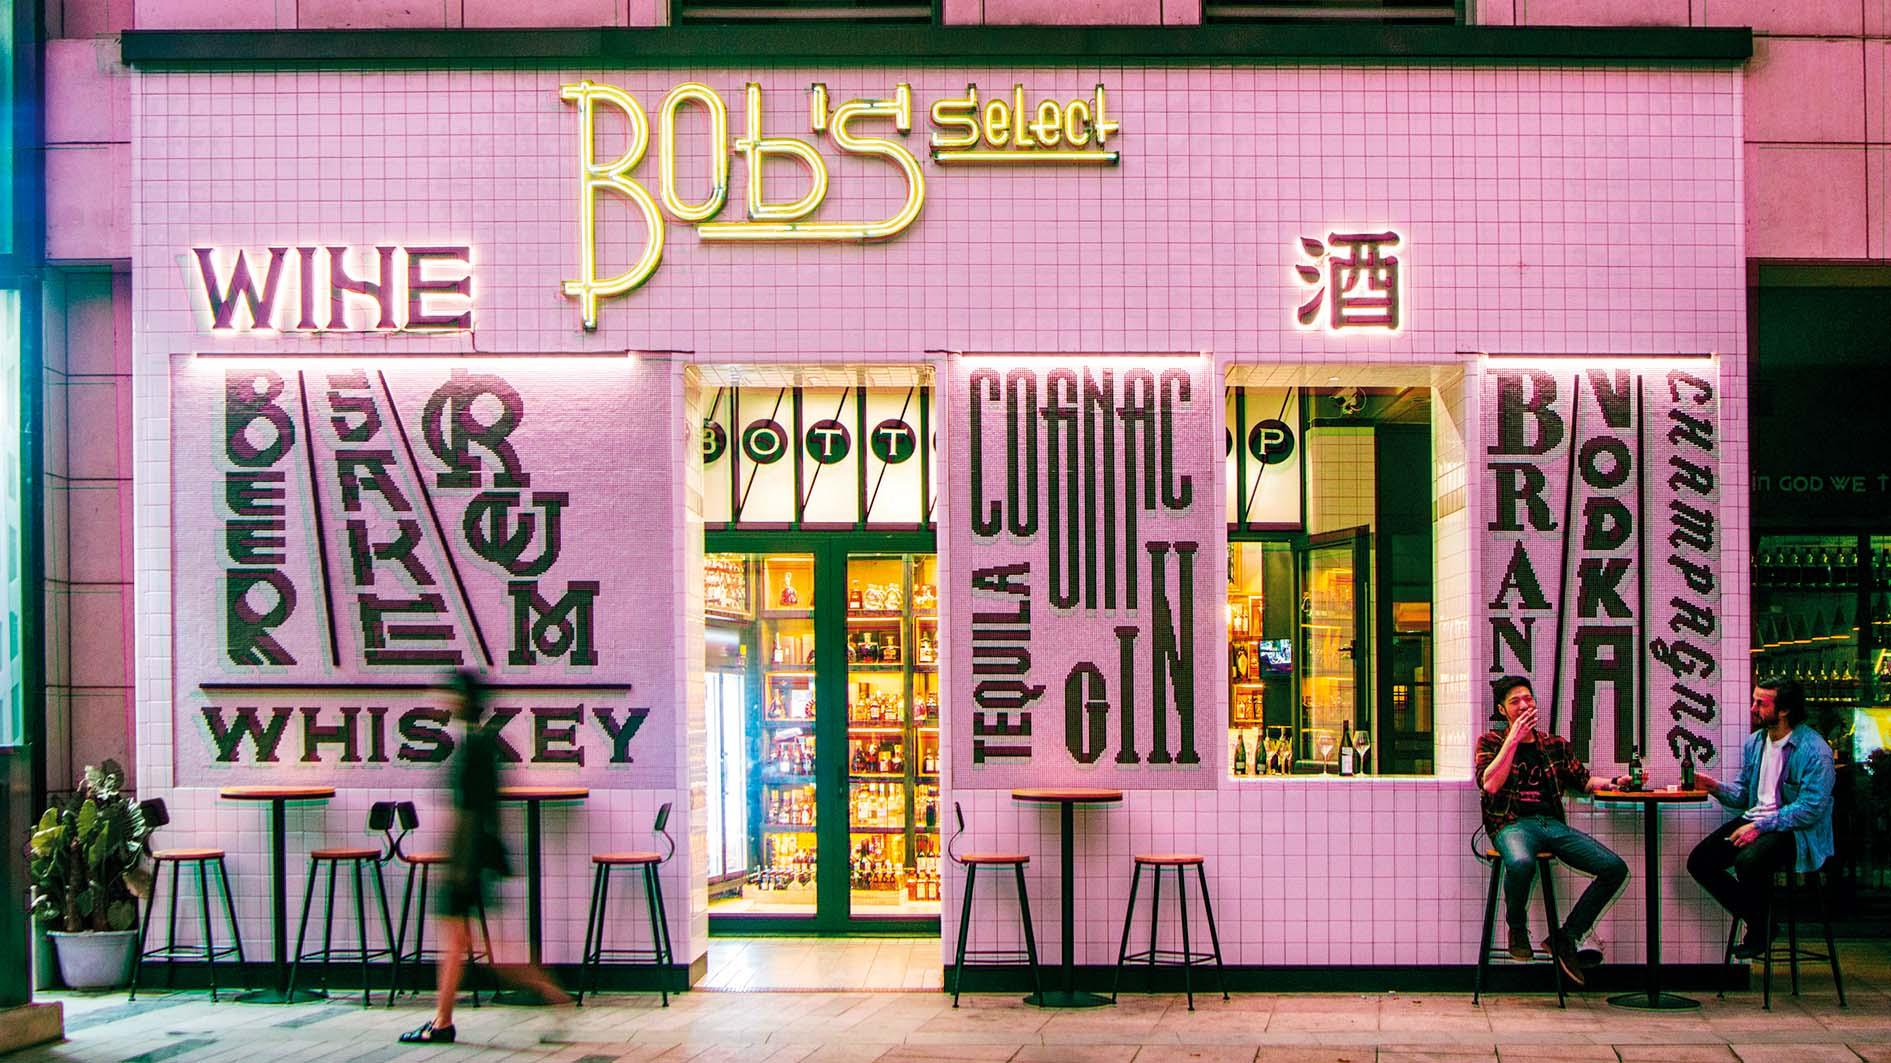 Designreserve - fasada Bob's Select bara u Beijingu www.designreserve.com